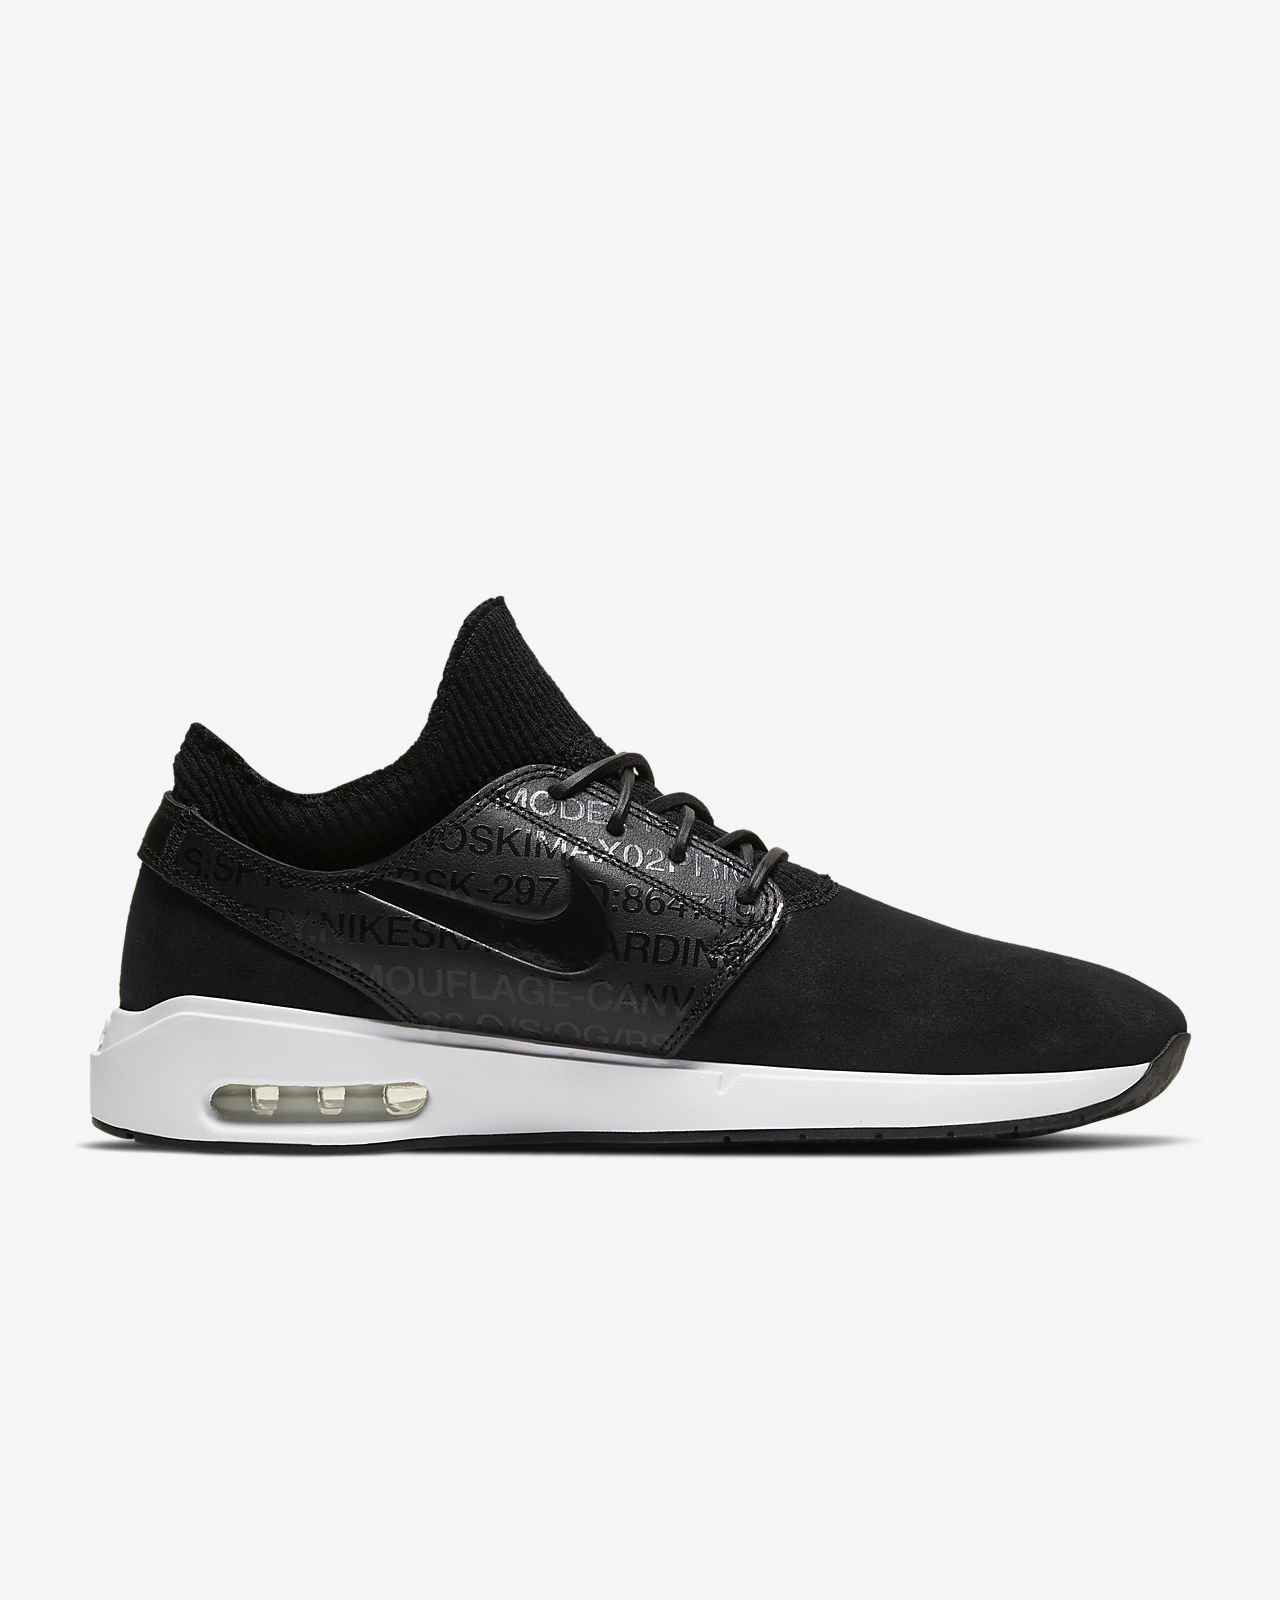 Nike Sb Kinder Janoski Air Max Black & White Skate Schuhe